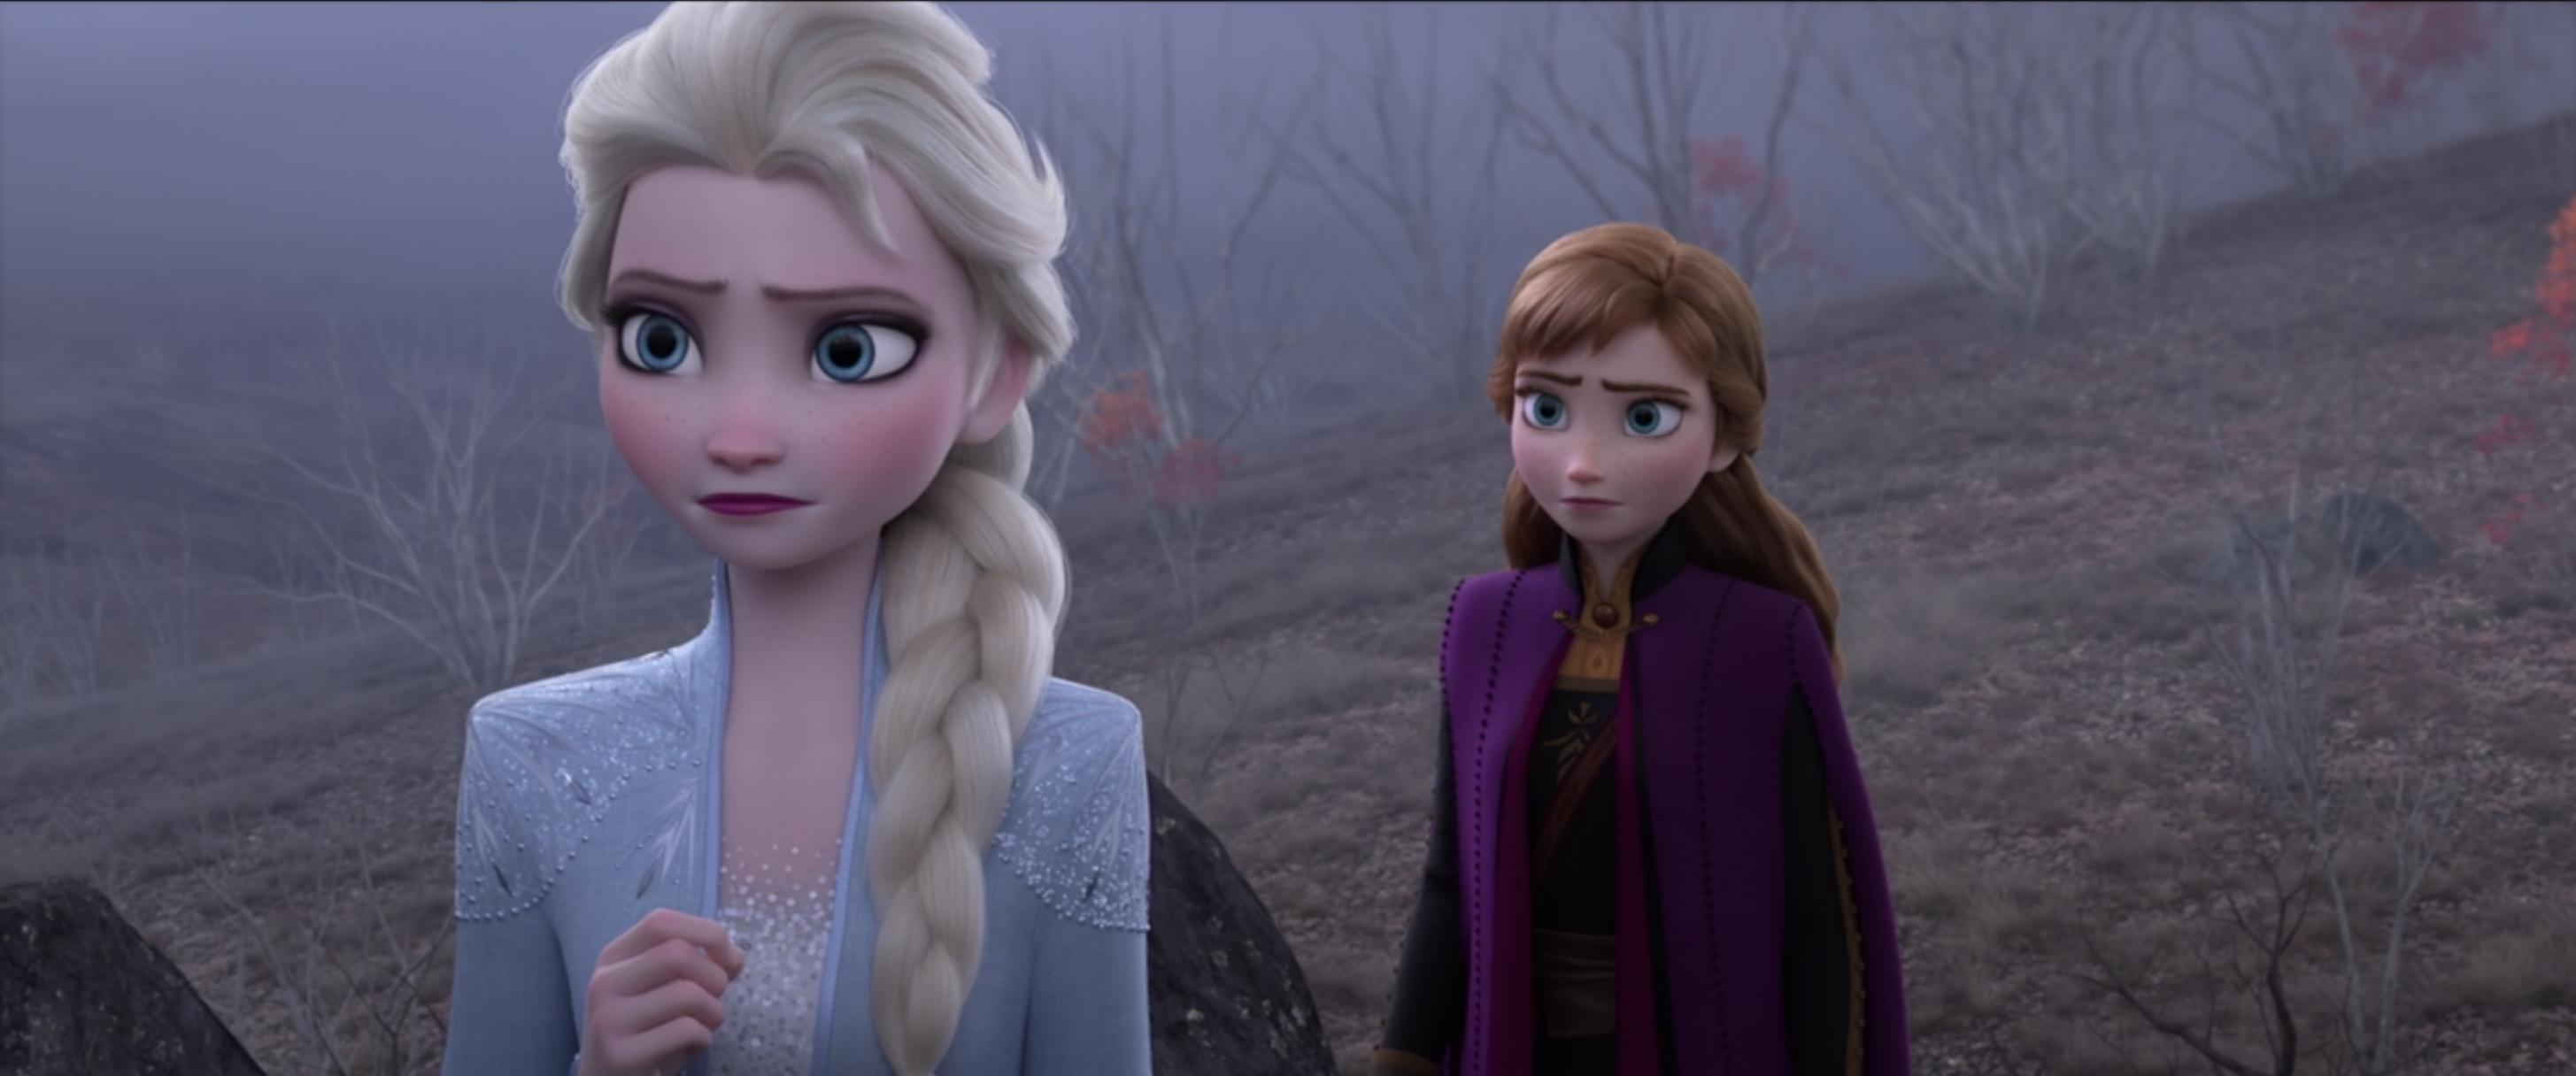 Elsa and Anna concerned